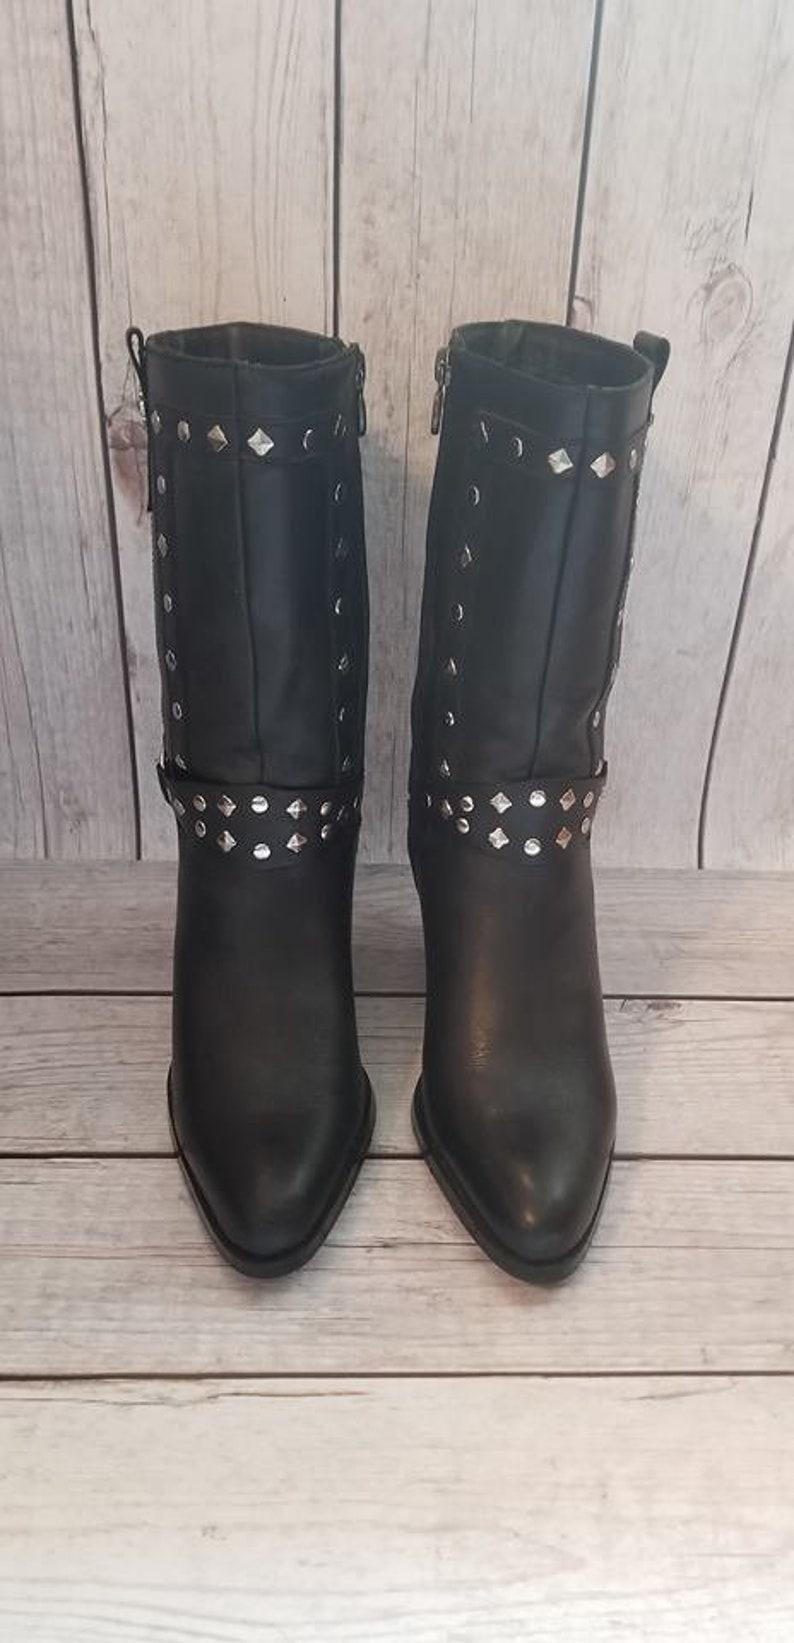 381b0eb38f23e Size 7 M Women s Black Leather Studded Strut Harley